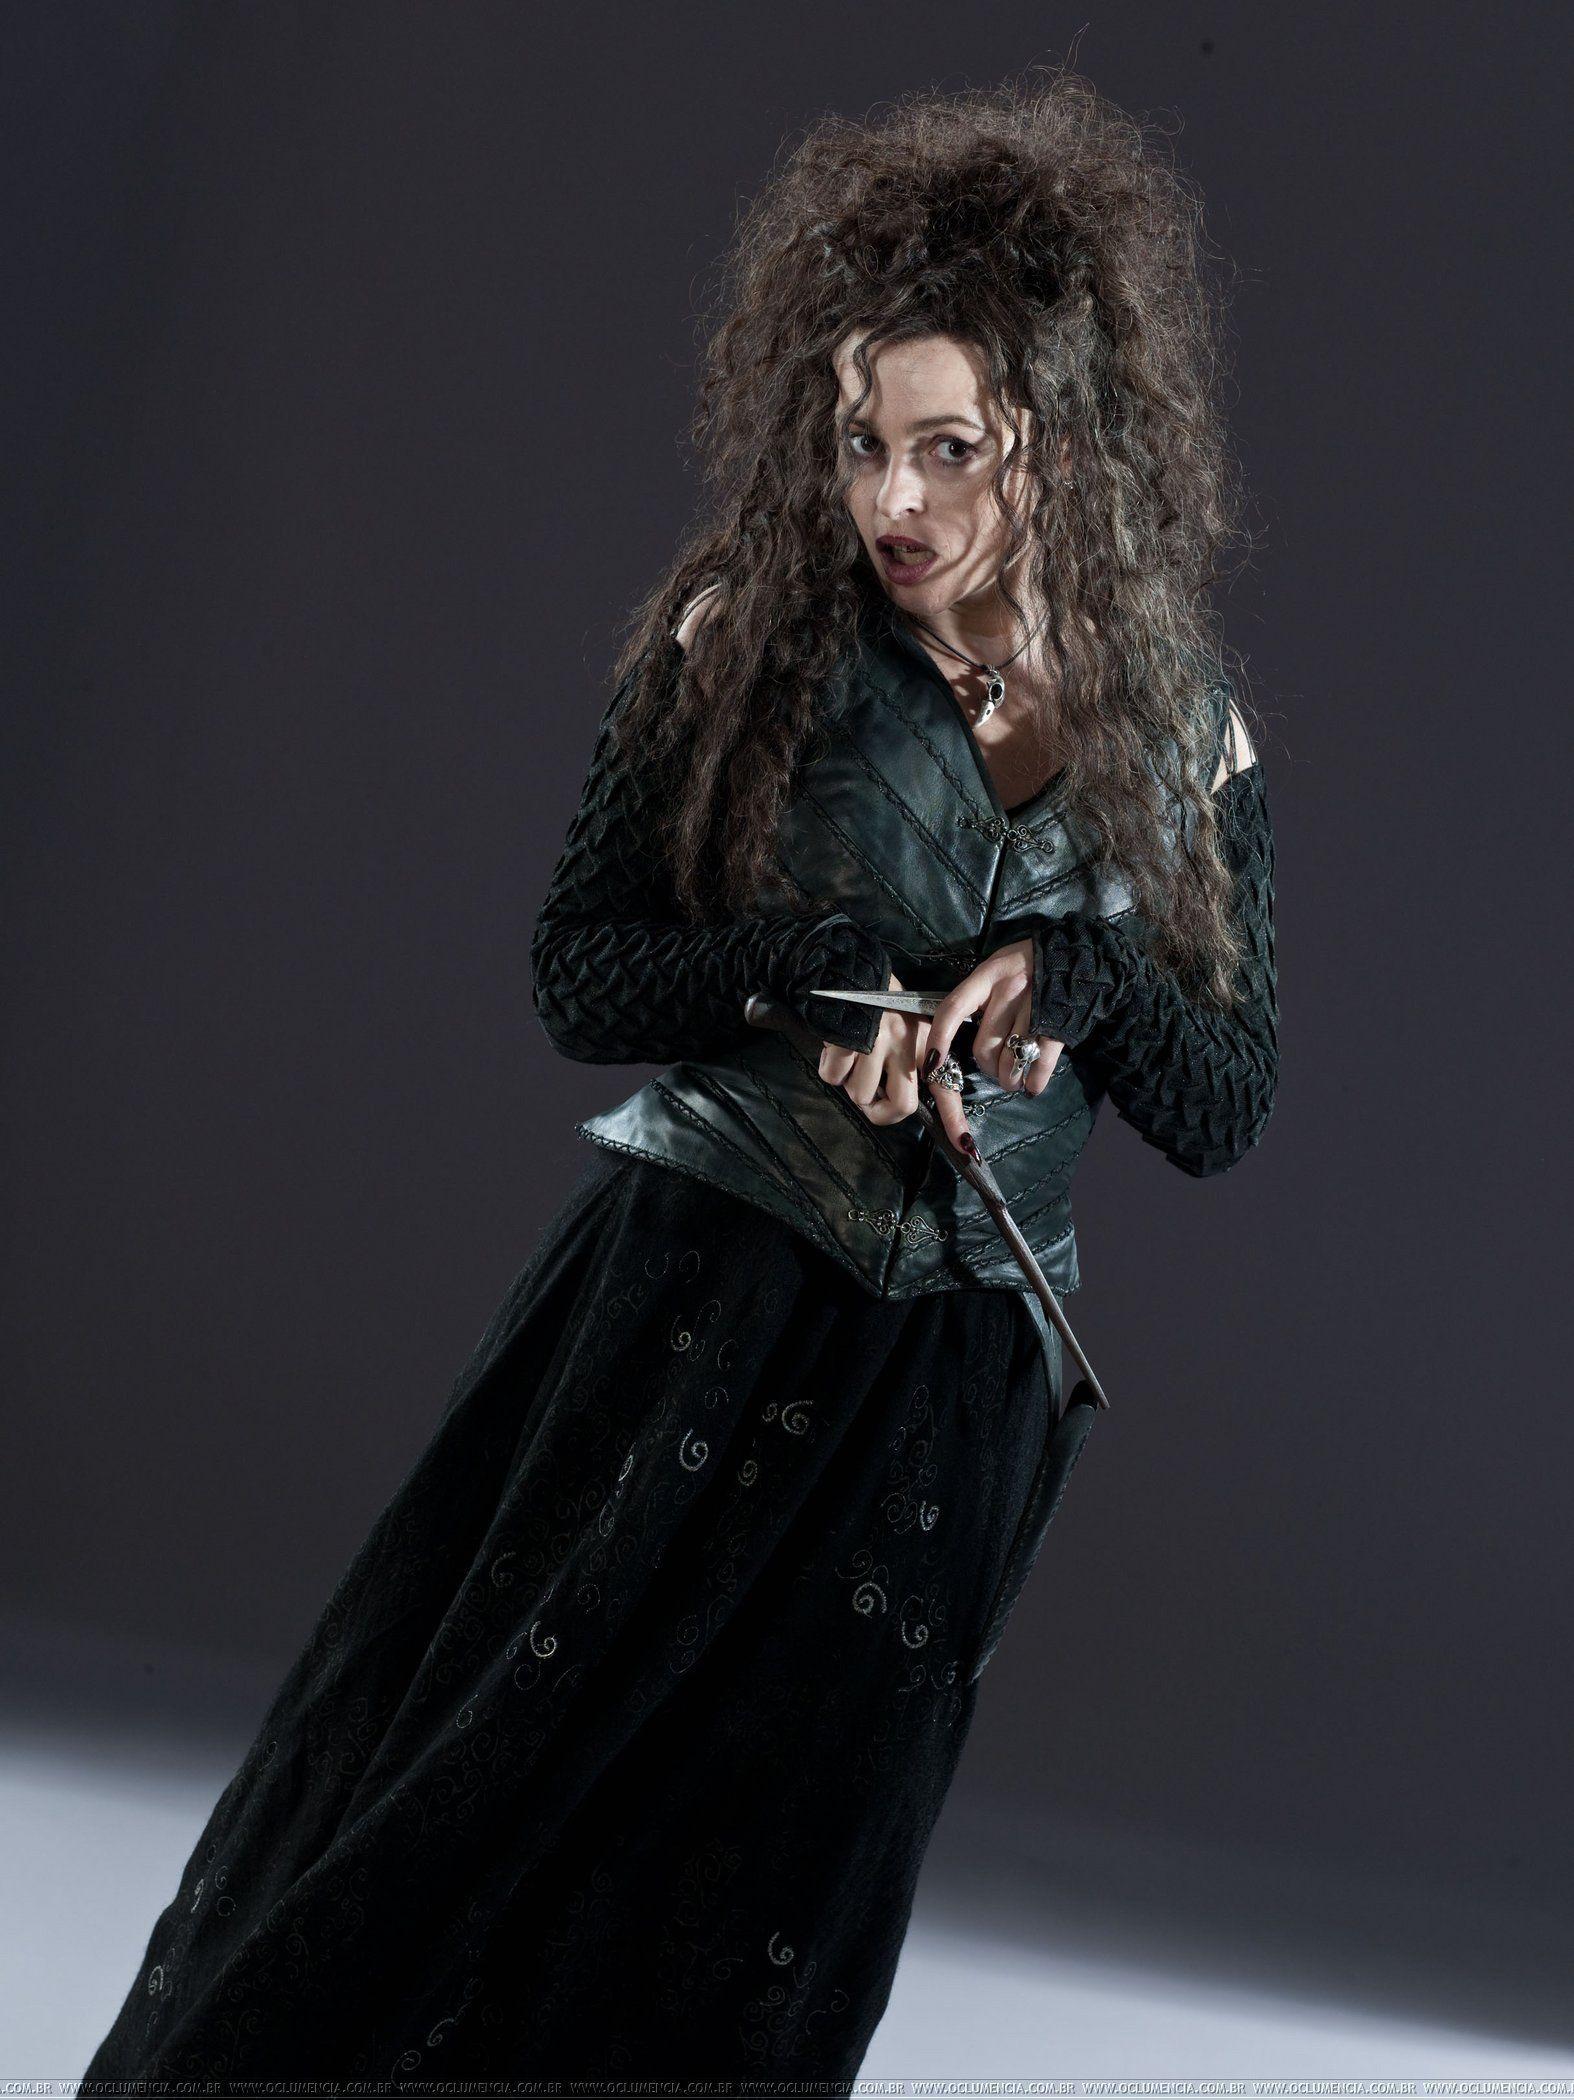 Bellatrix Lestrange Photo Bellatrix Dh Harry Potter Bellatrix Lestrange Bellatrix Lestrange Helena Bonham Carter